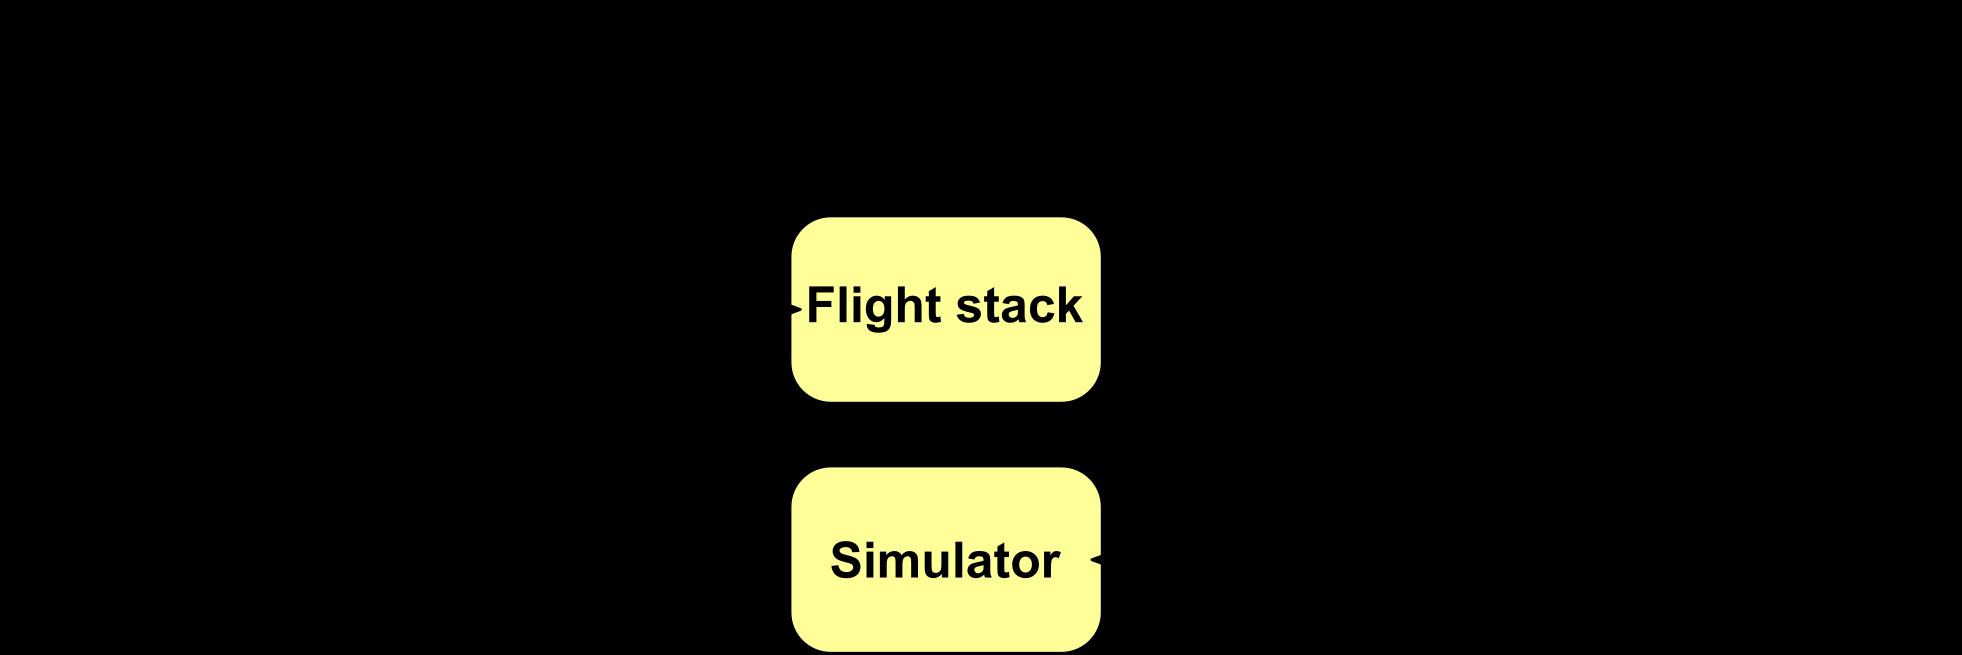 Simulation · PX4 v1 9 0 Developer Guide